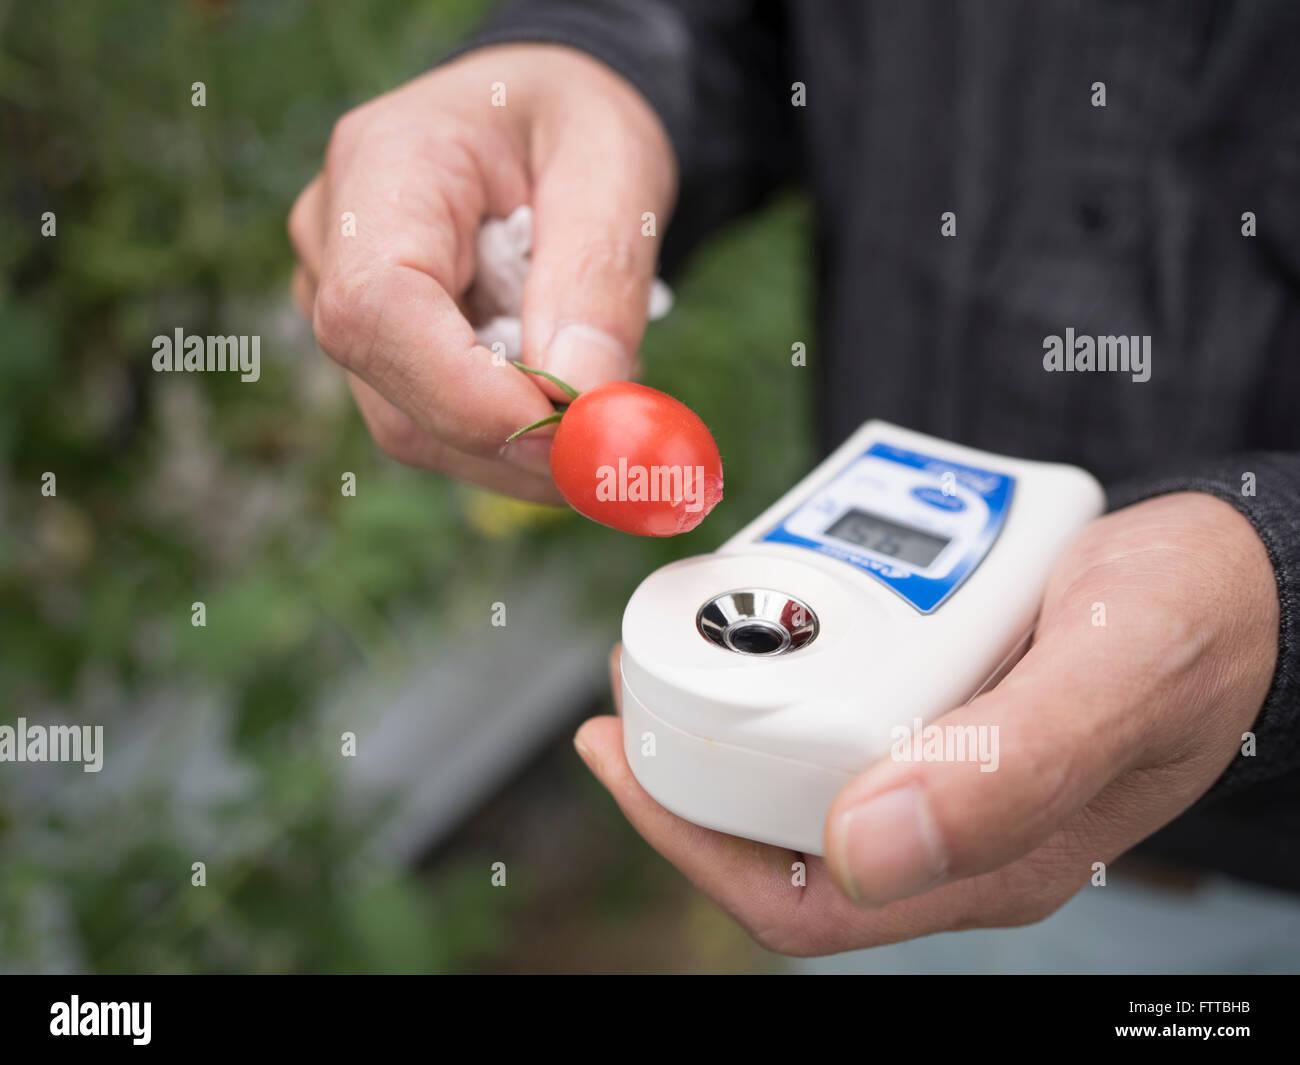 Atago Digital, Brix, Pocket, Hand-Held Refractometer to measure sweetness of tomatoes - Stock Image